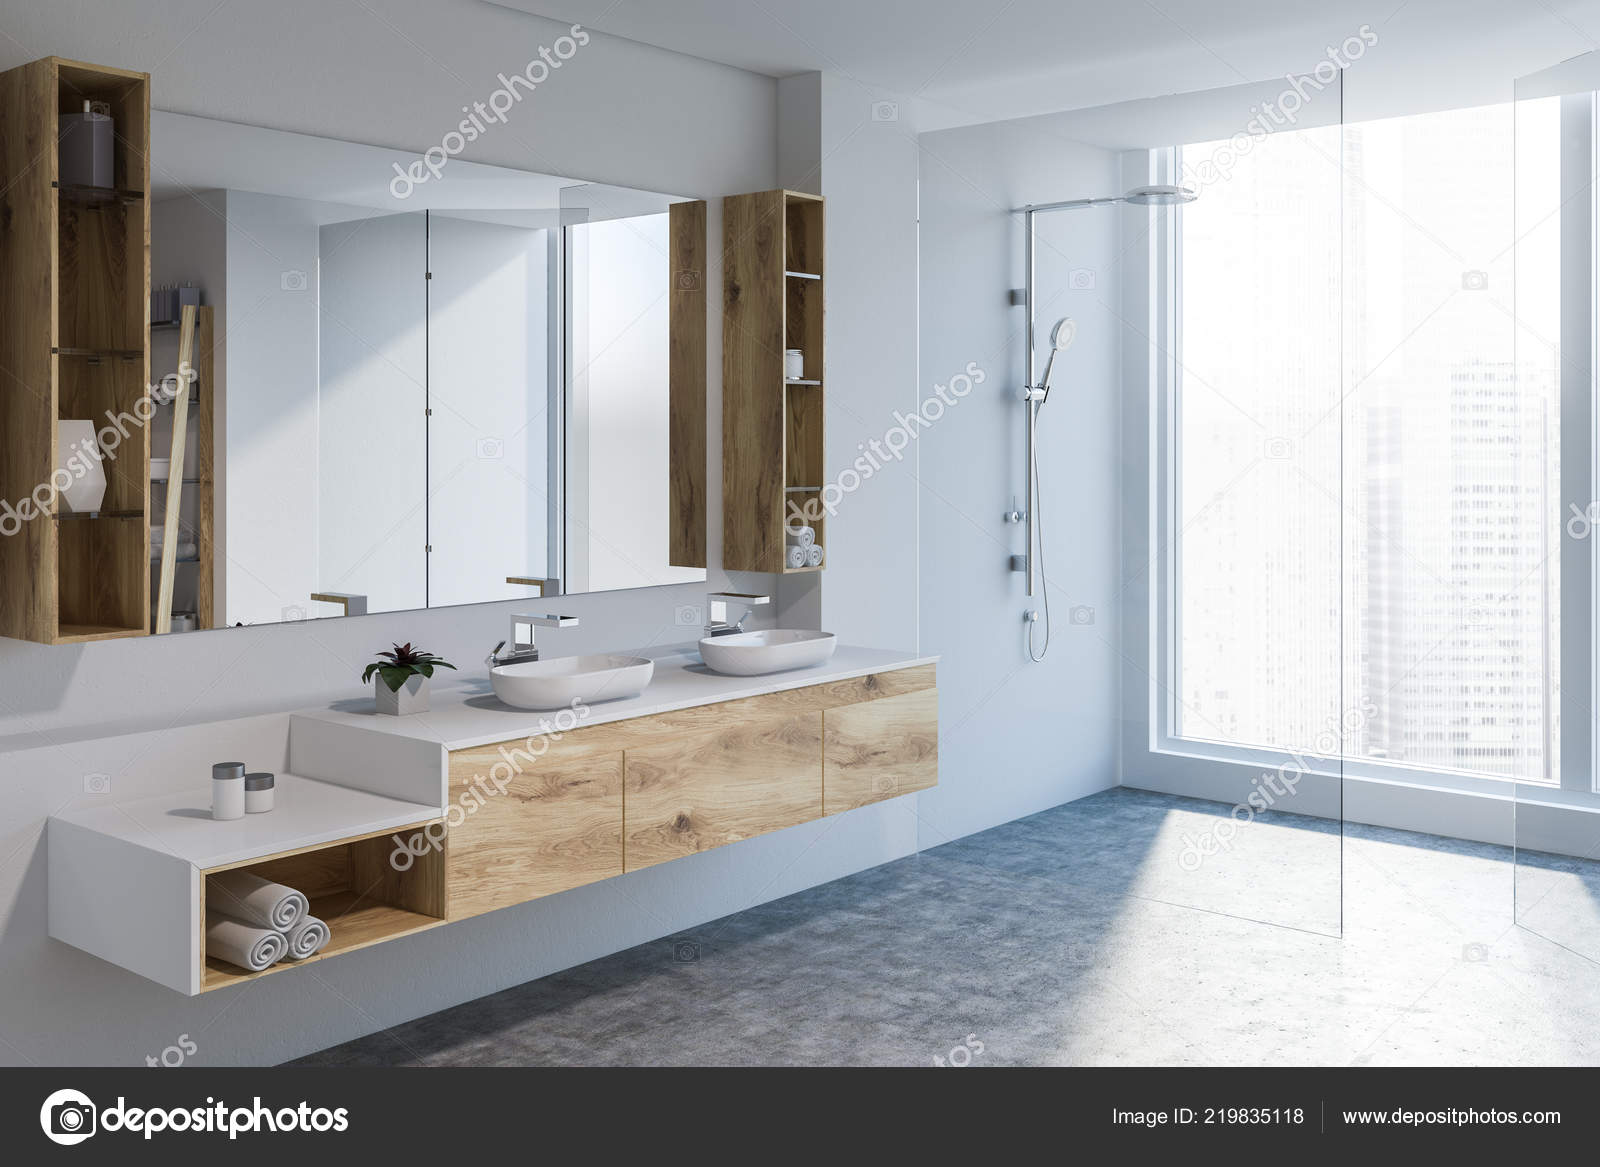 Grote Wastafel Badkamer : Moderne badkamer hoek met witte muren betonnen vloer dubbele